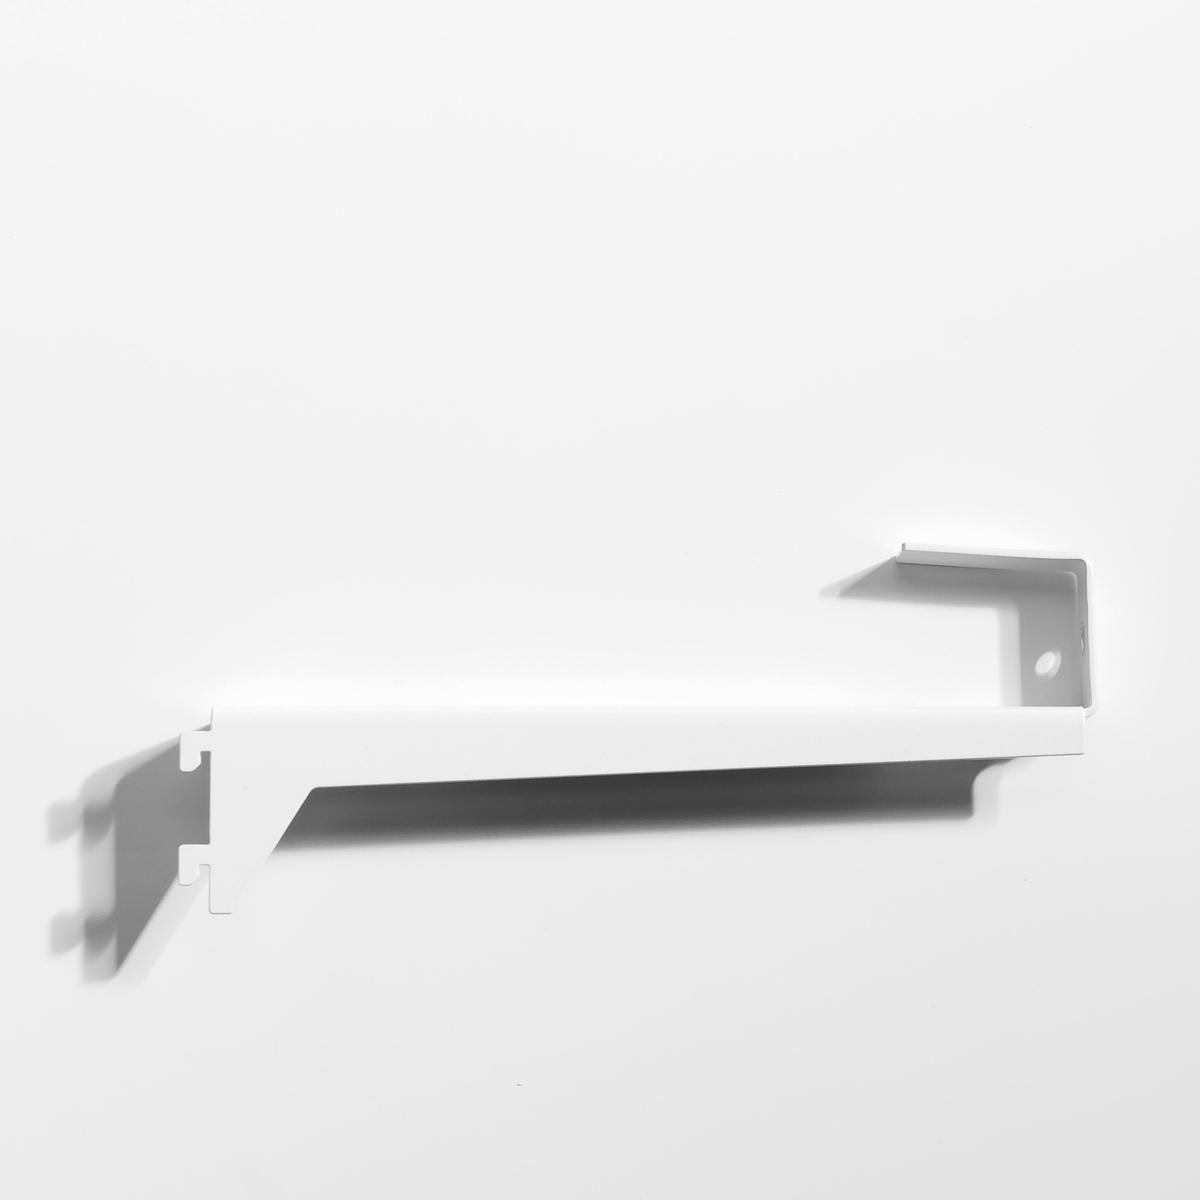 Кронштейн угловой для этажерок Kyriel (2 шт)